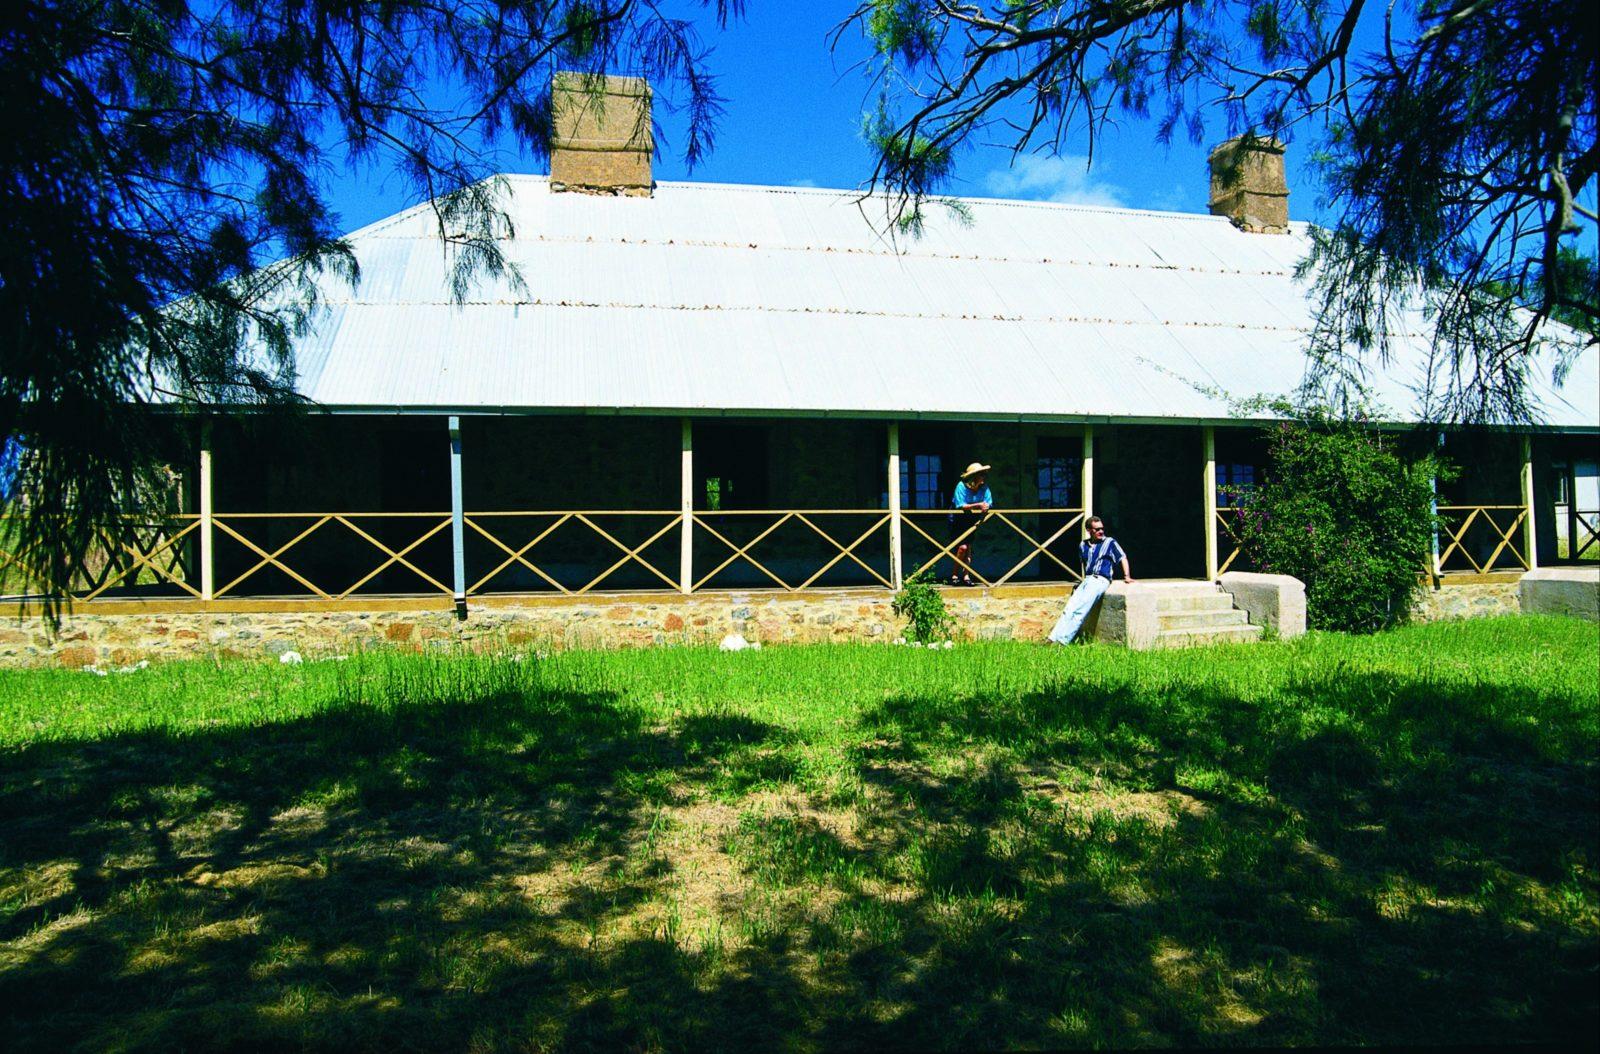 Carnamah, Western Australia